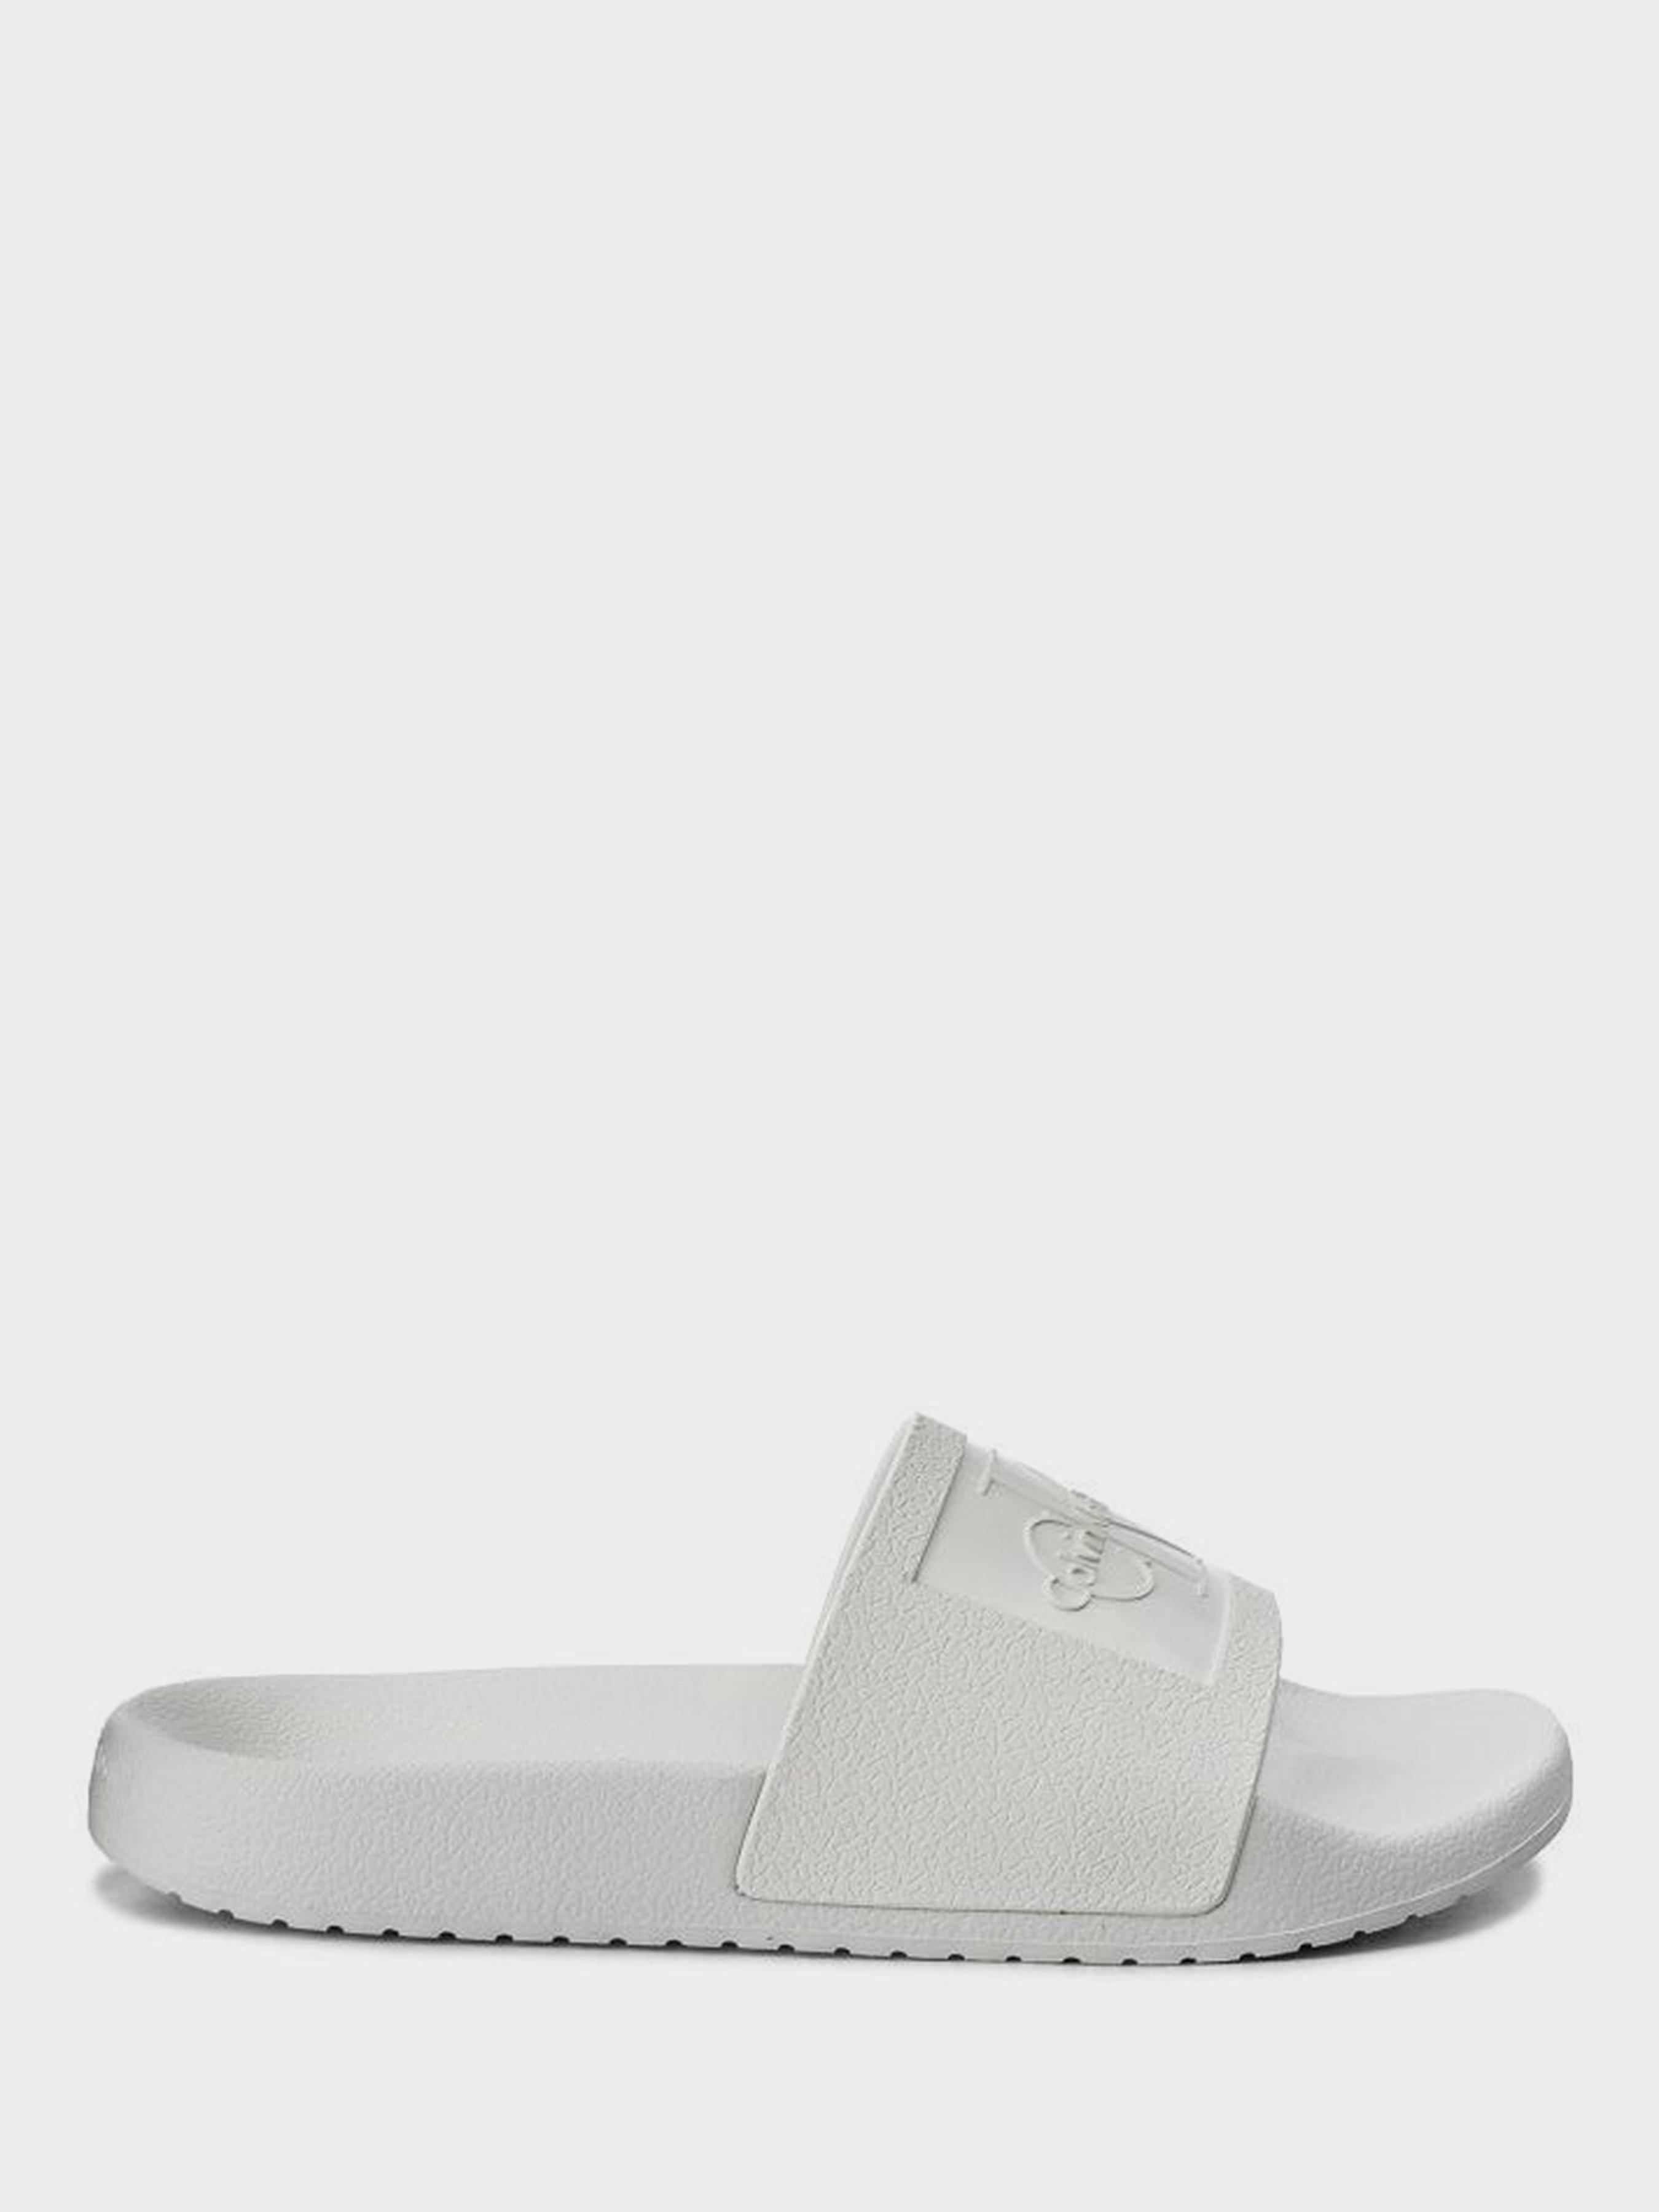 Купить Шлёпанцы женские Calvin Klein Jeans 3Y85, Белый